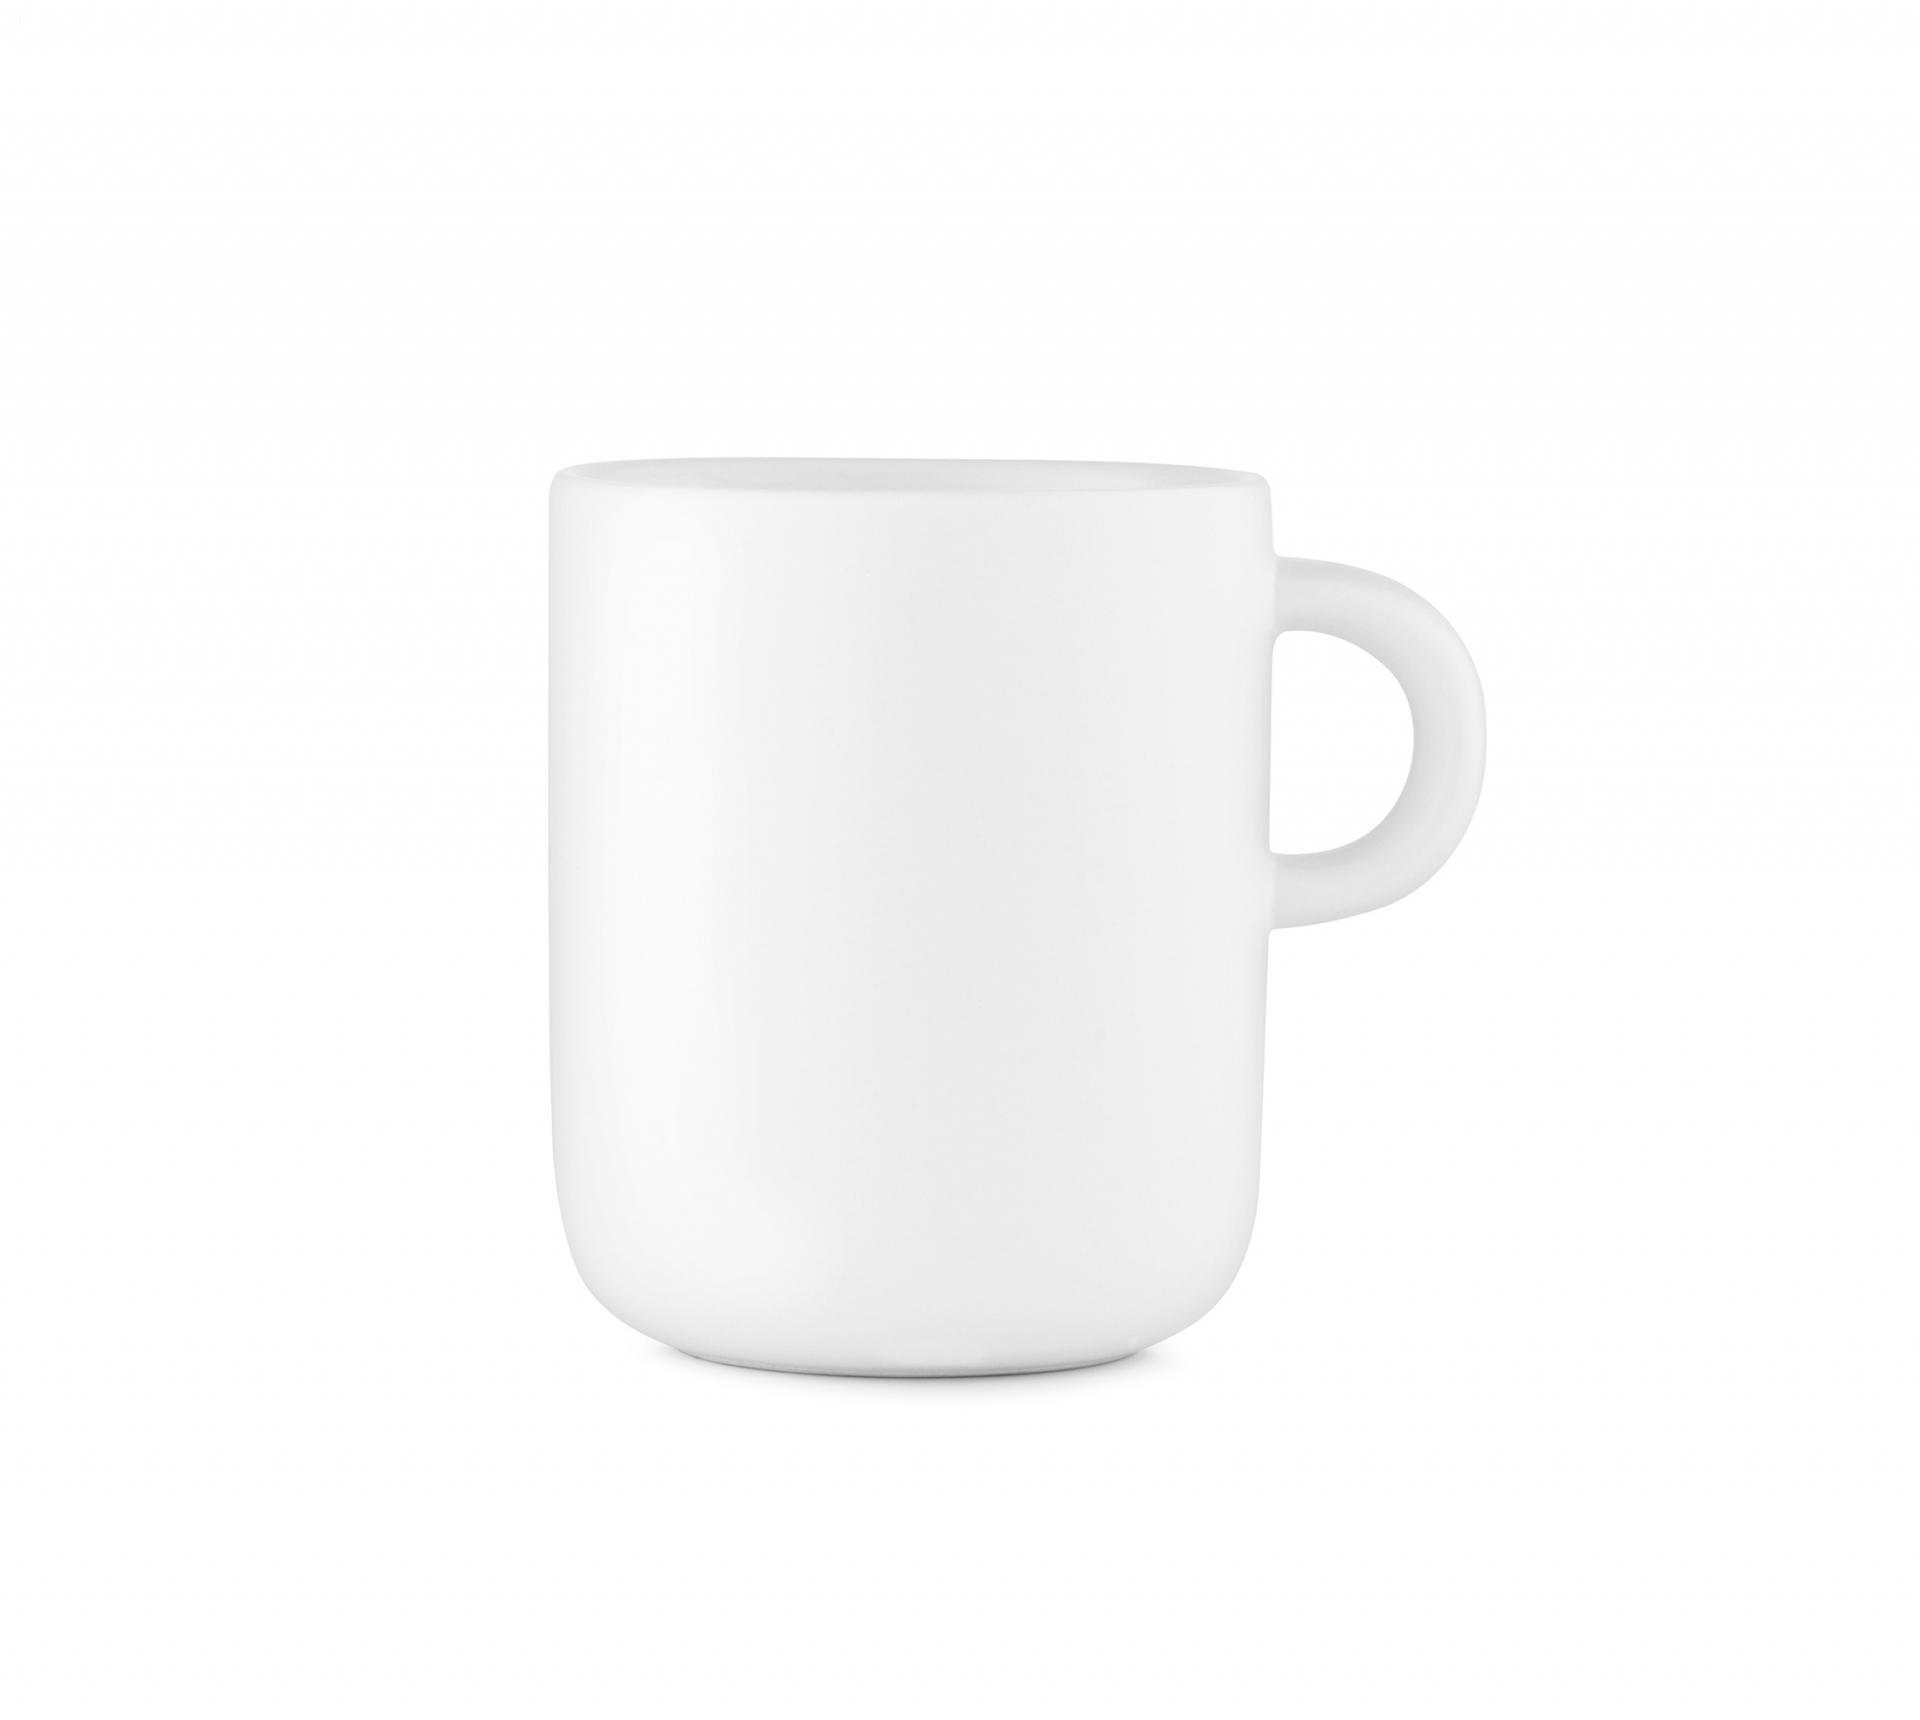 normann COPENHAGEN Porcelánový hrnek Bliss White, bílá barva, porcelán